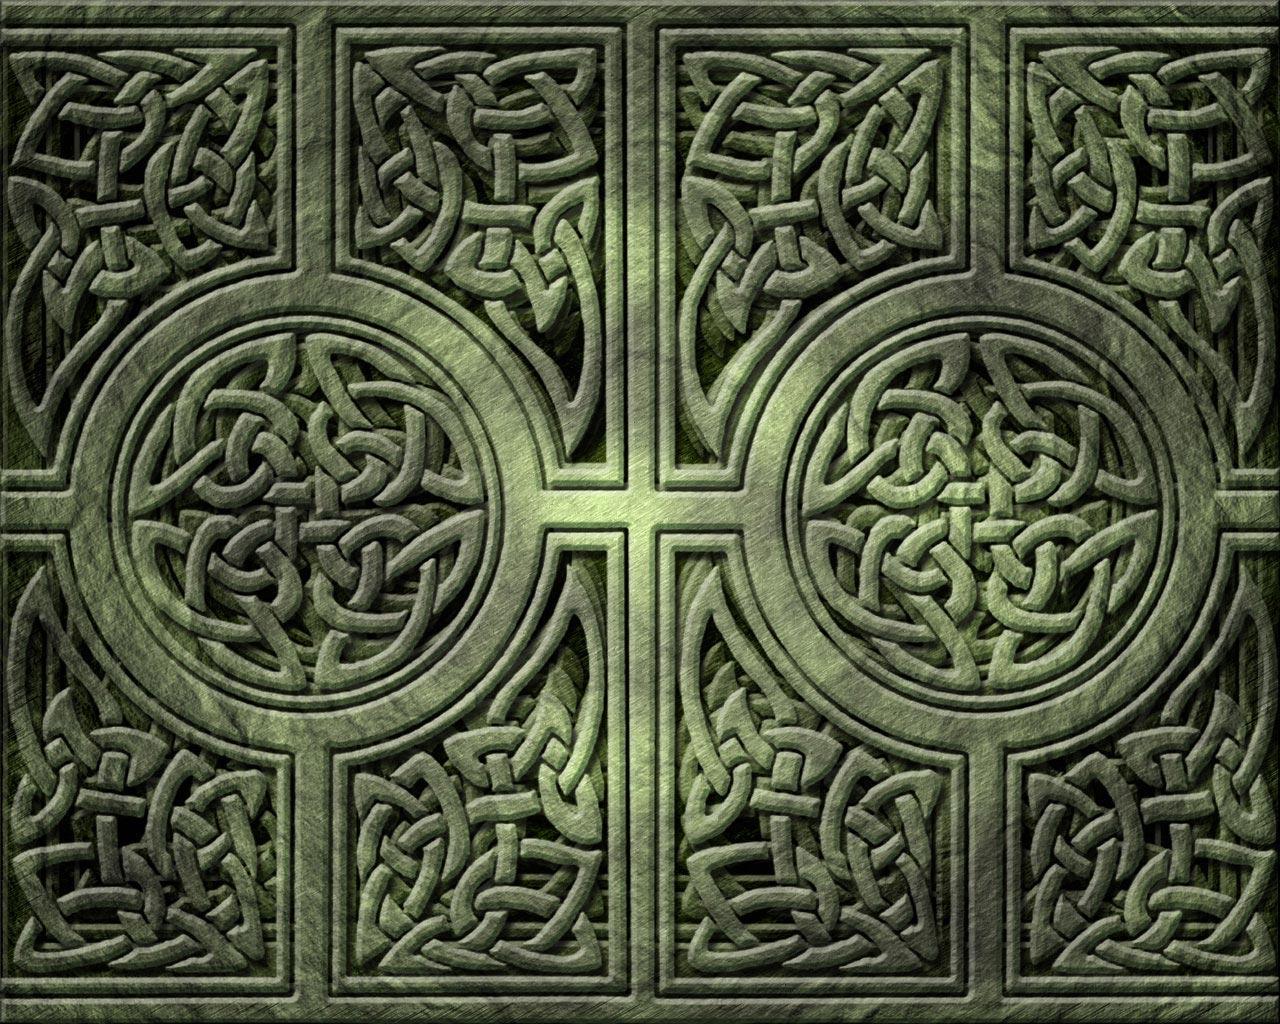 Best 39 Celtic Knot Backgrounds for Desktop on HipWallpaper 1280x1024